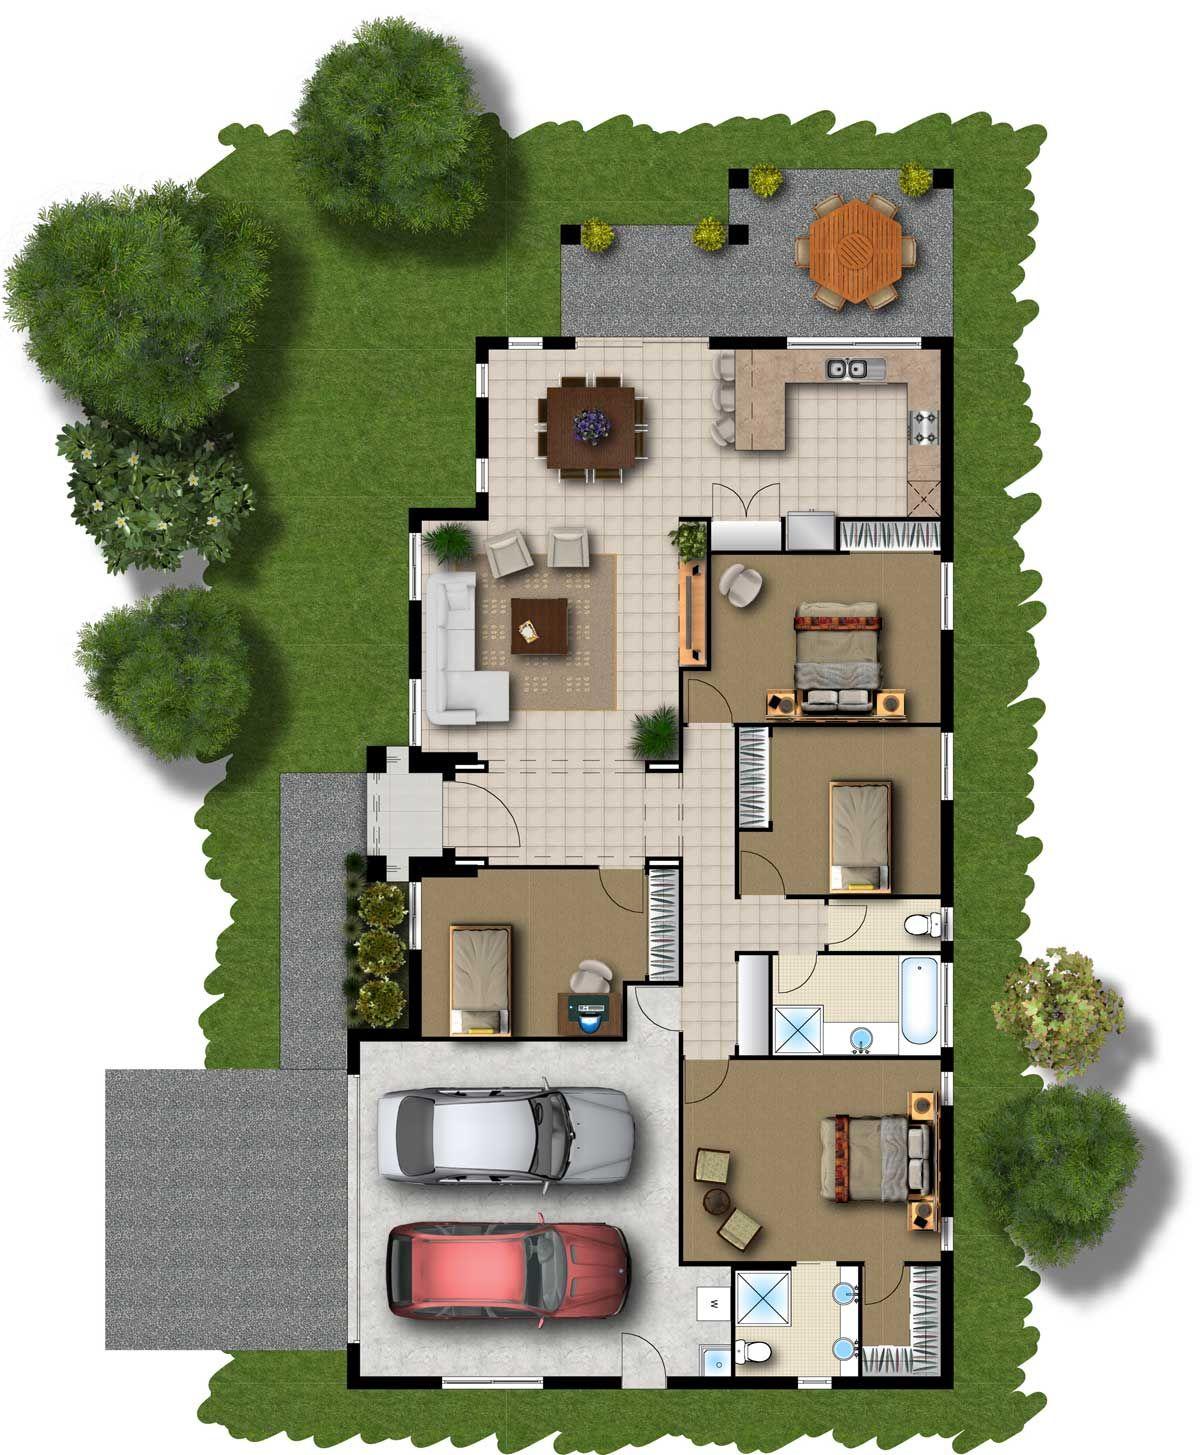 House Floor Plans 3d Jpg 1200 1455 Floor Plan Design Simple House Design 3d House Plans